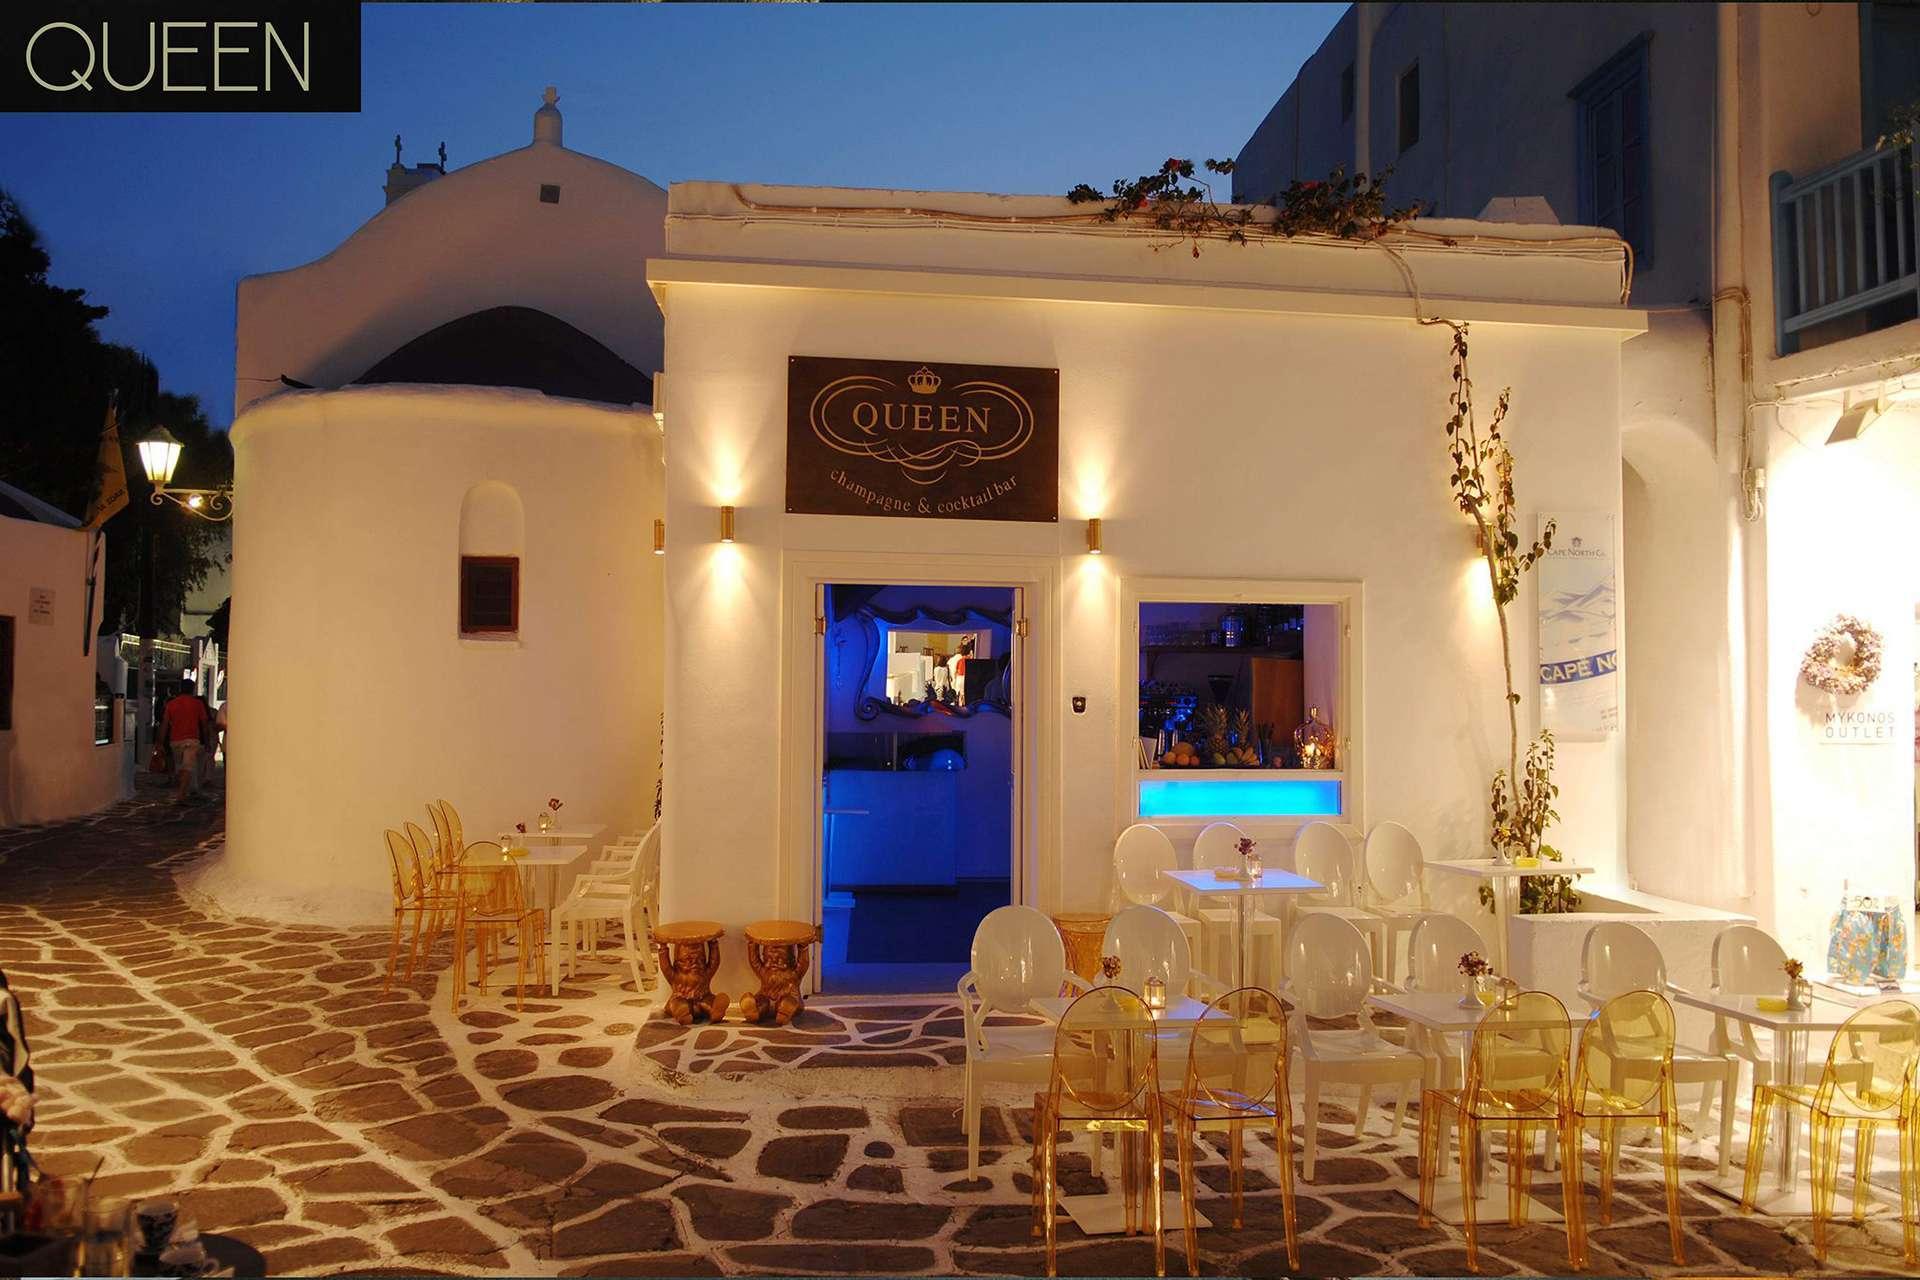 queen-bar-mykonos-bars-mykonos-exclusive